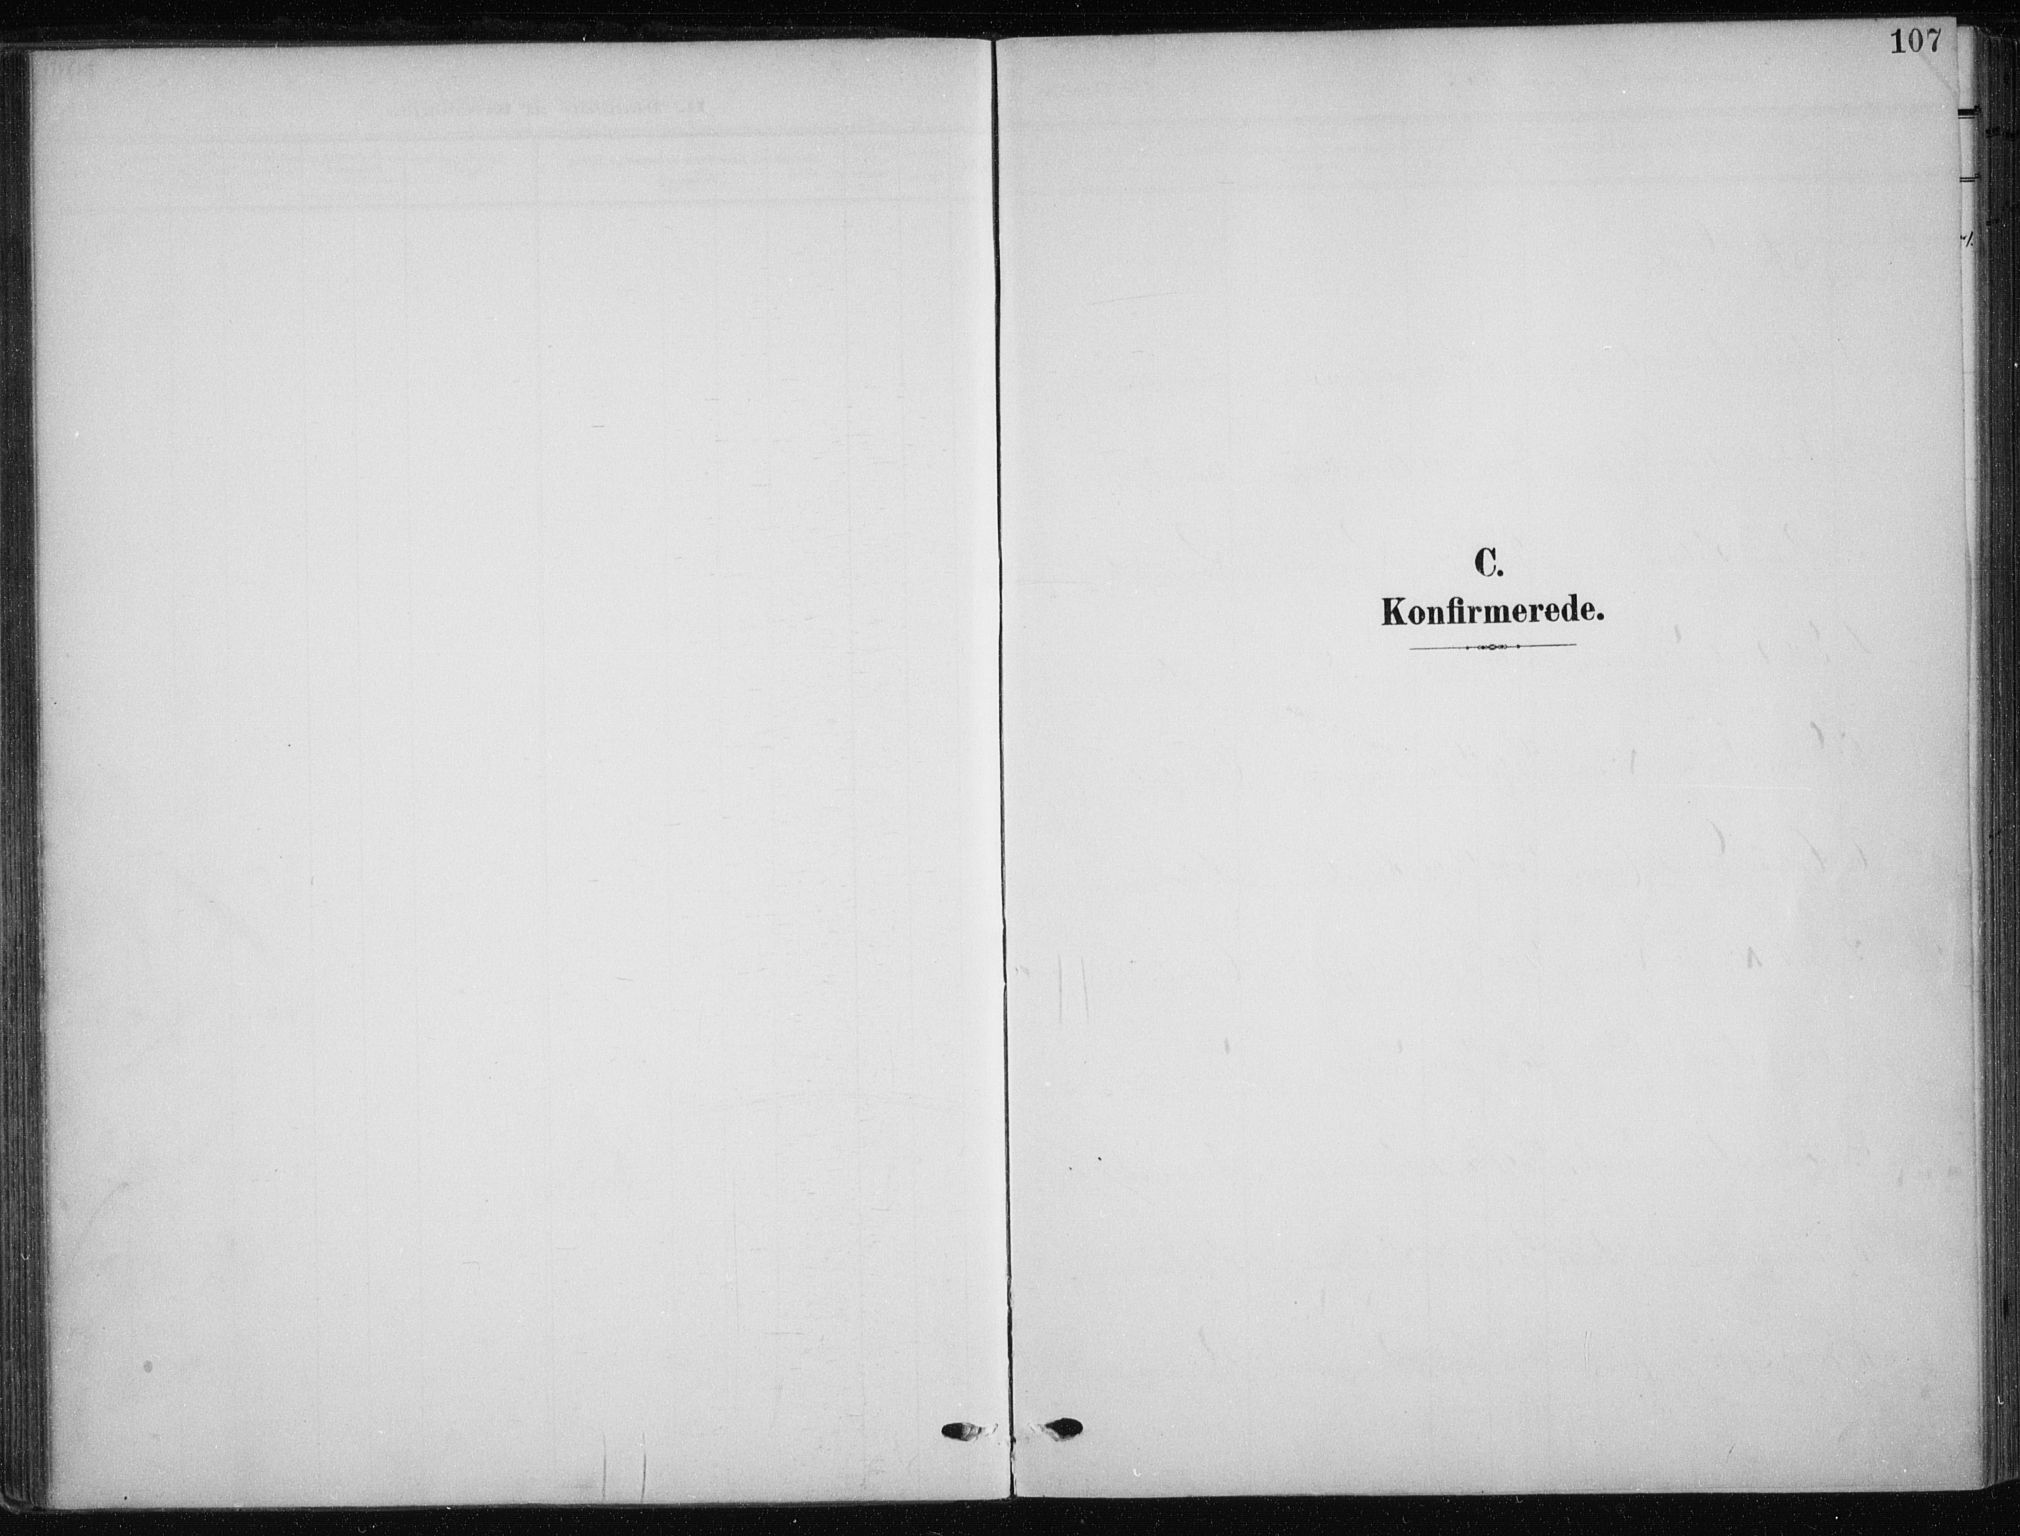 SATØ, Kistrand/Porsanger sokneprestembete, H/Ha/L0014.kirke: Ministerialbok nr. 14, 1908-1917, s. 107